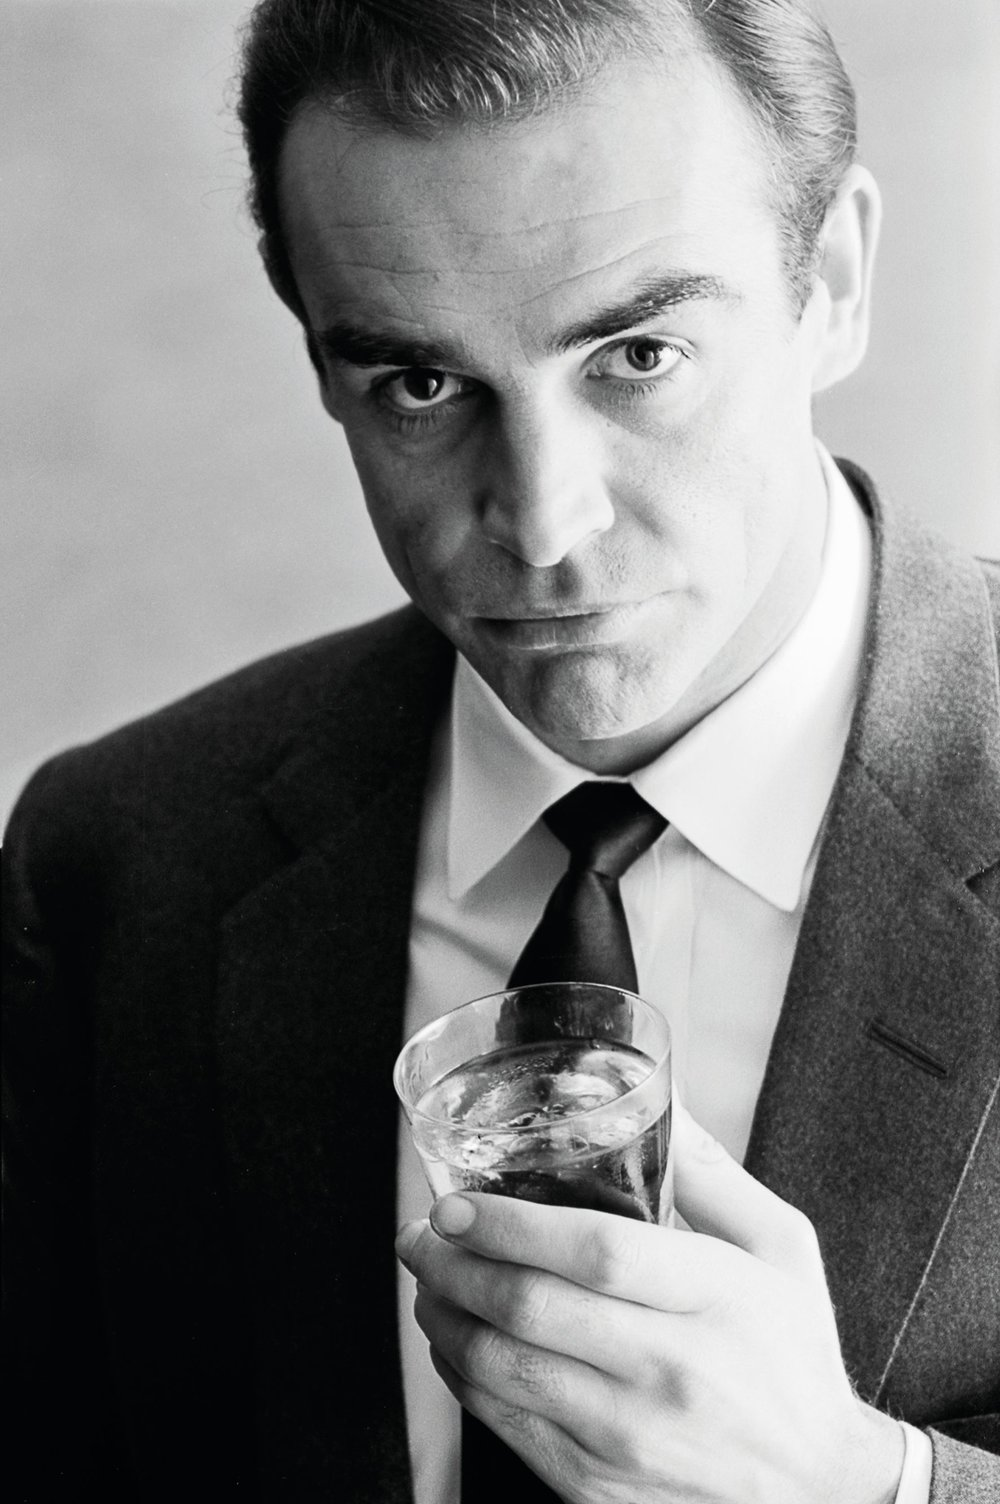 Sean Connery, Advertising Shoot for Smirnoff Vodka, 1962